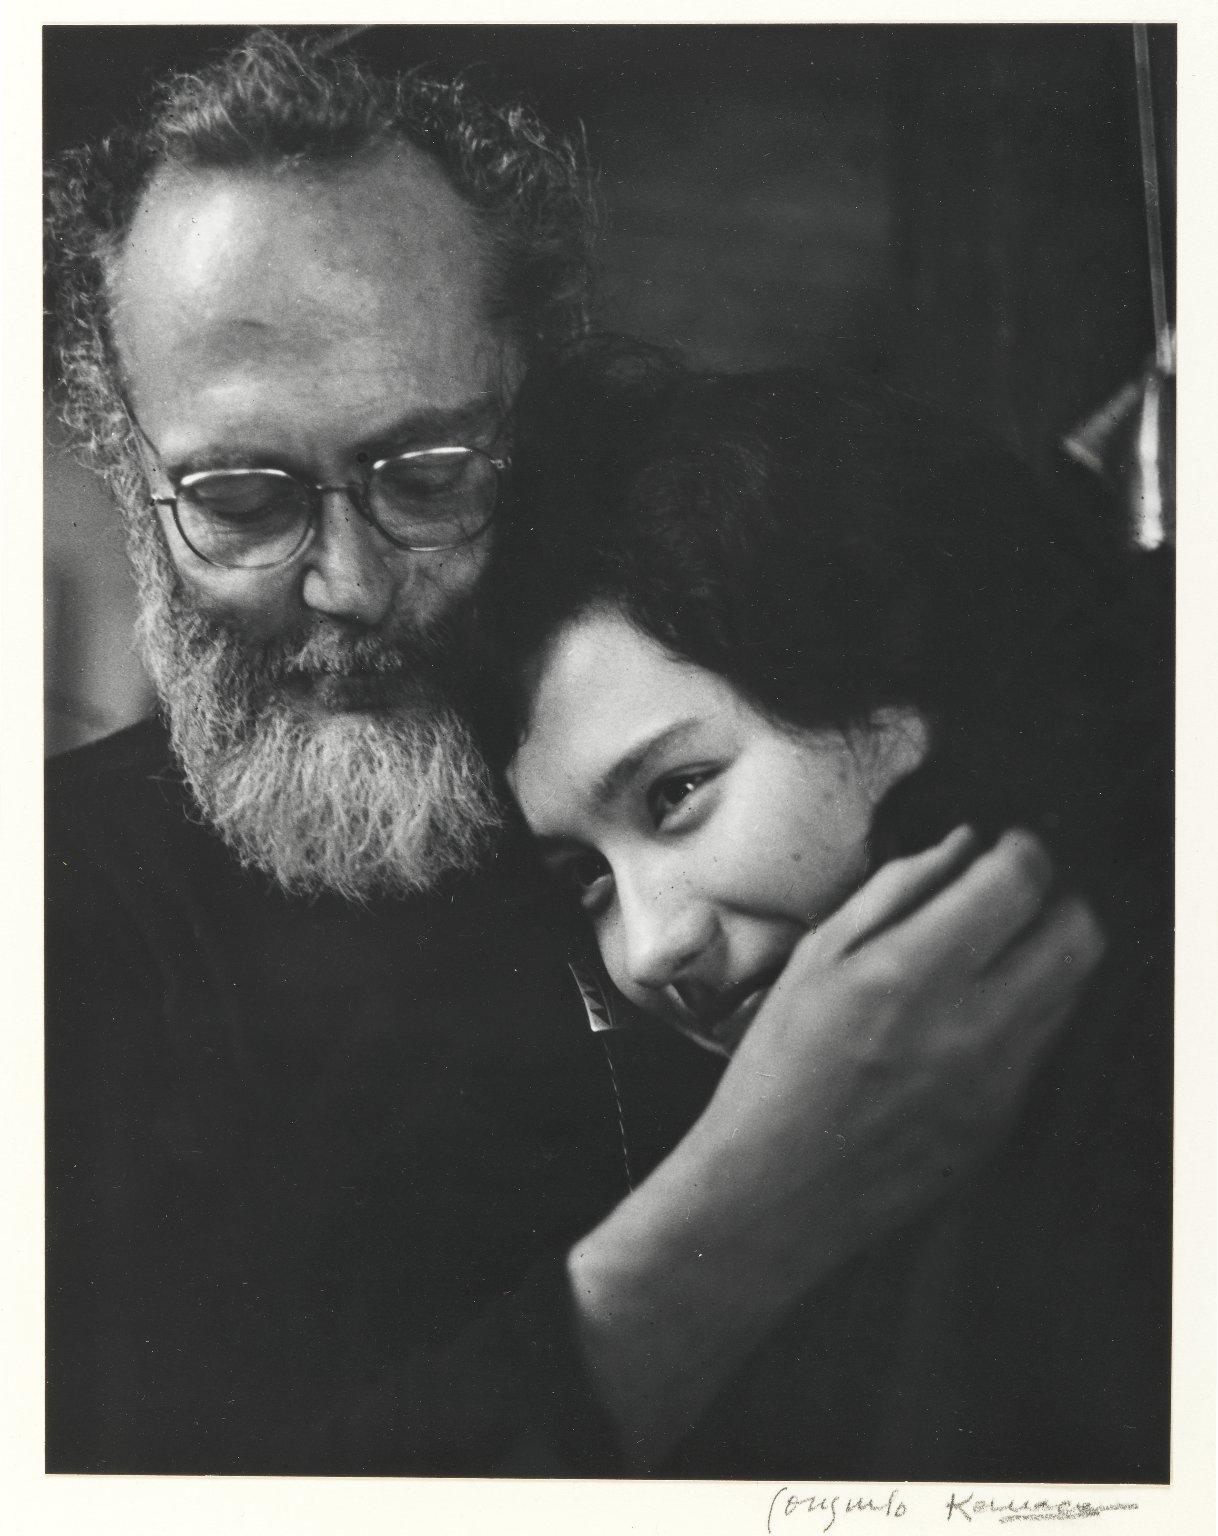 Image of W. Eugene Smith from Wikidata